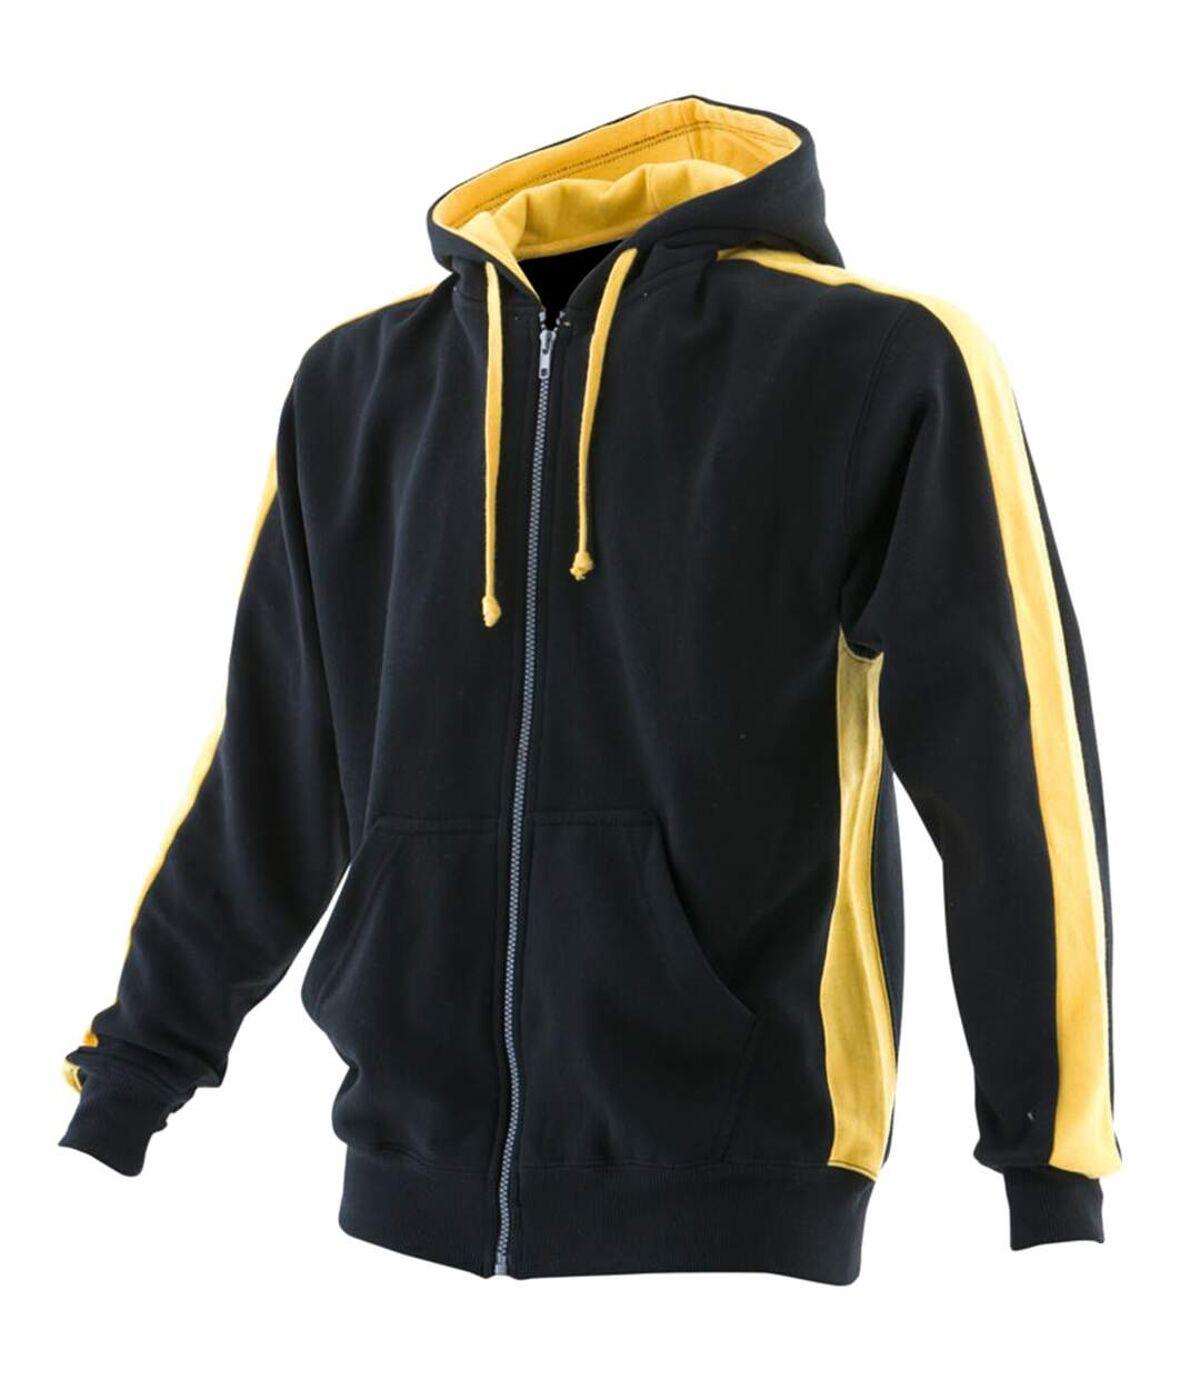 Finden & Hales Mens Full Zip Hooded Sweatshirt / Hoodie (Black/Red) - UTRW421